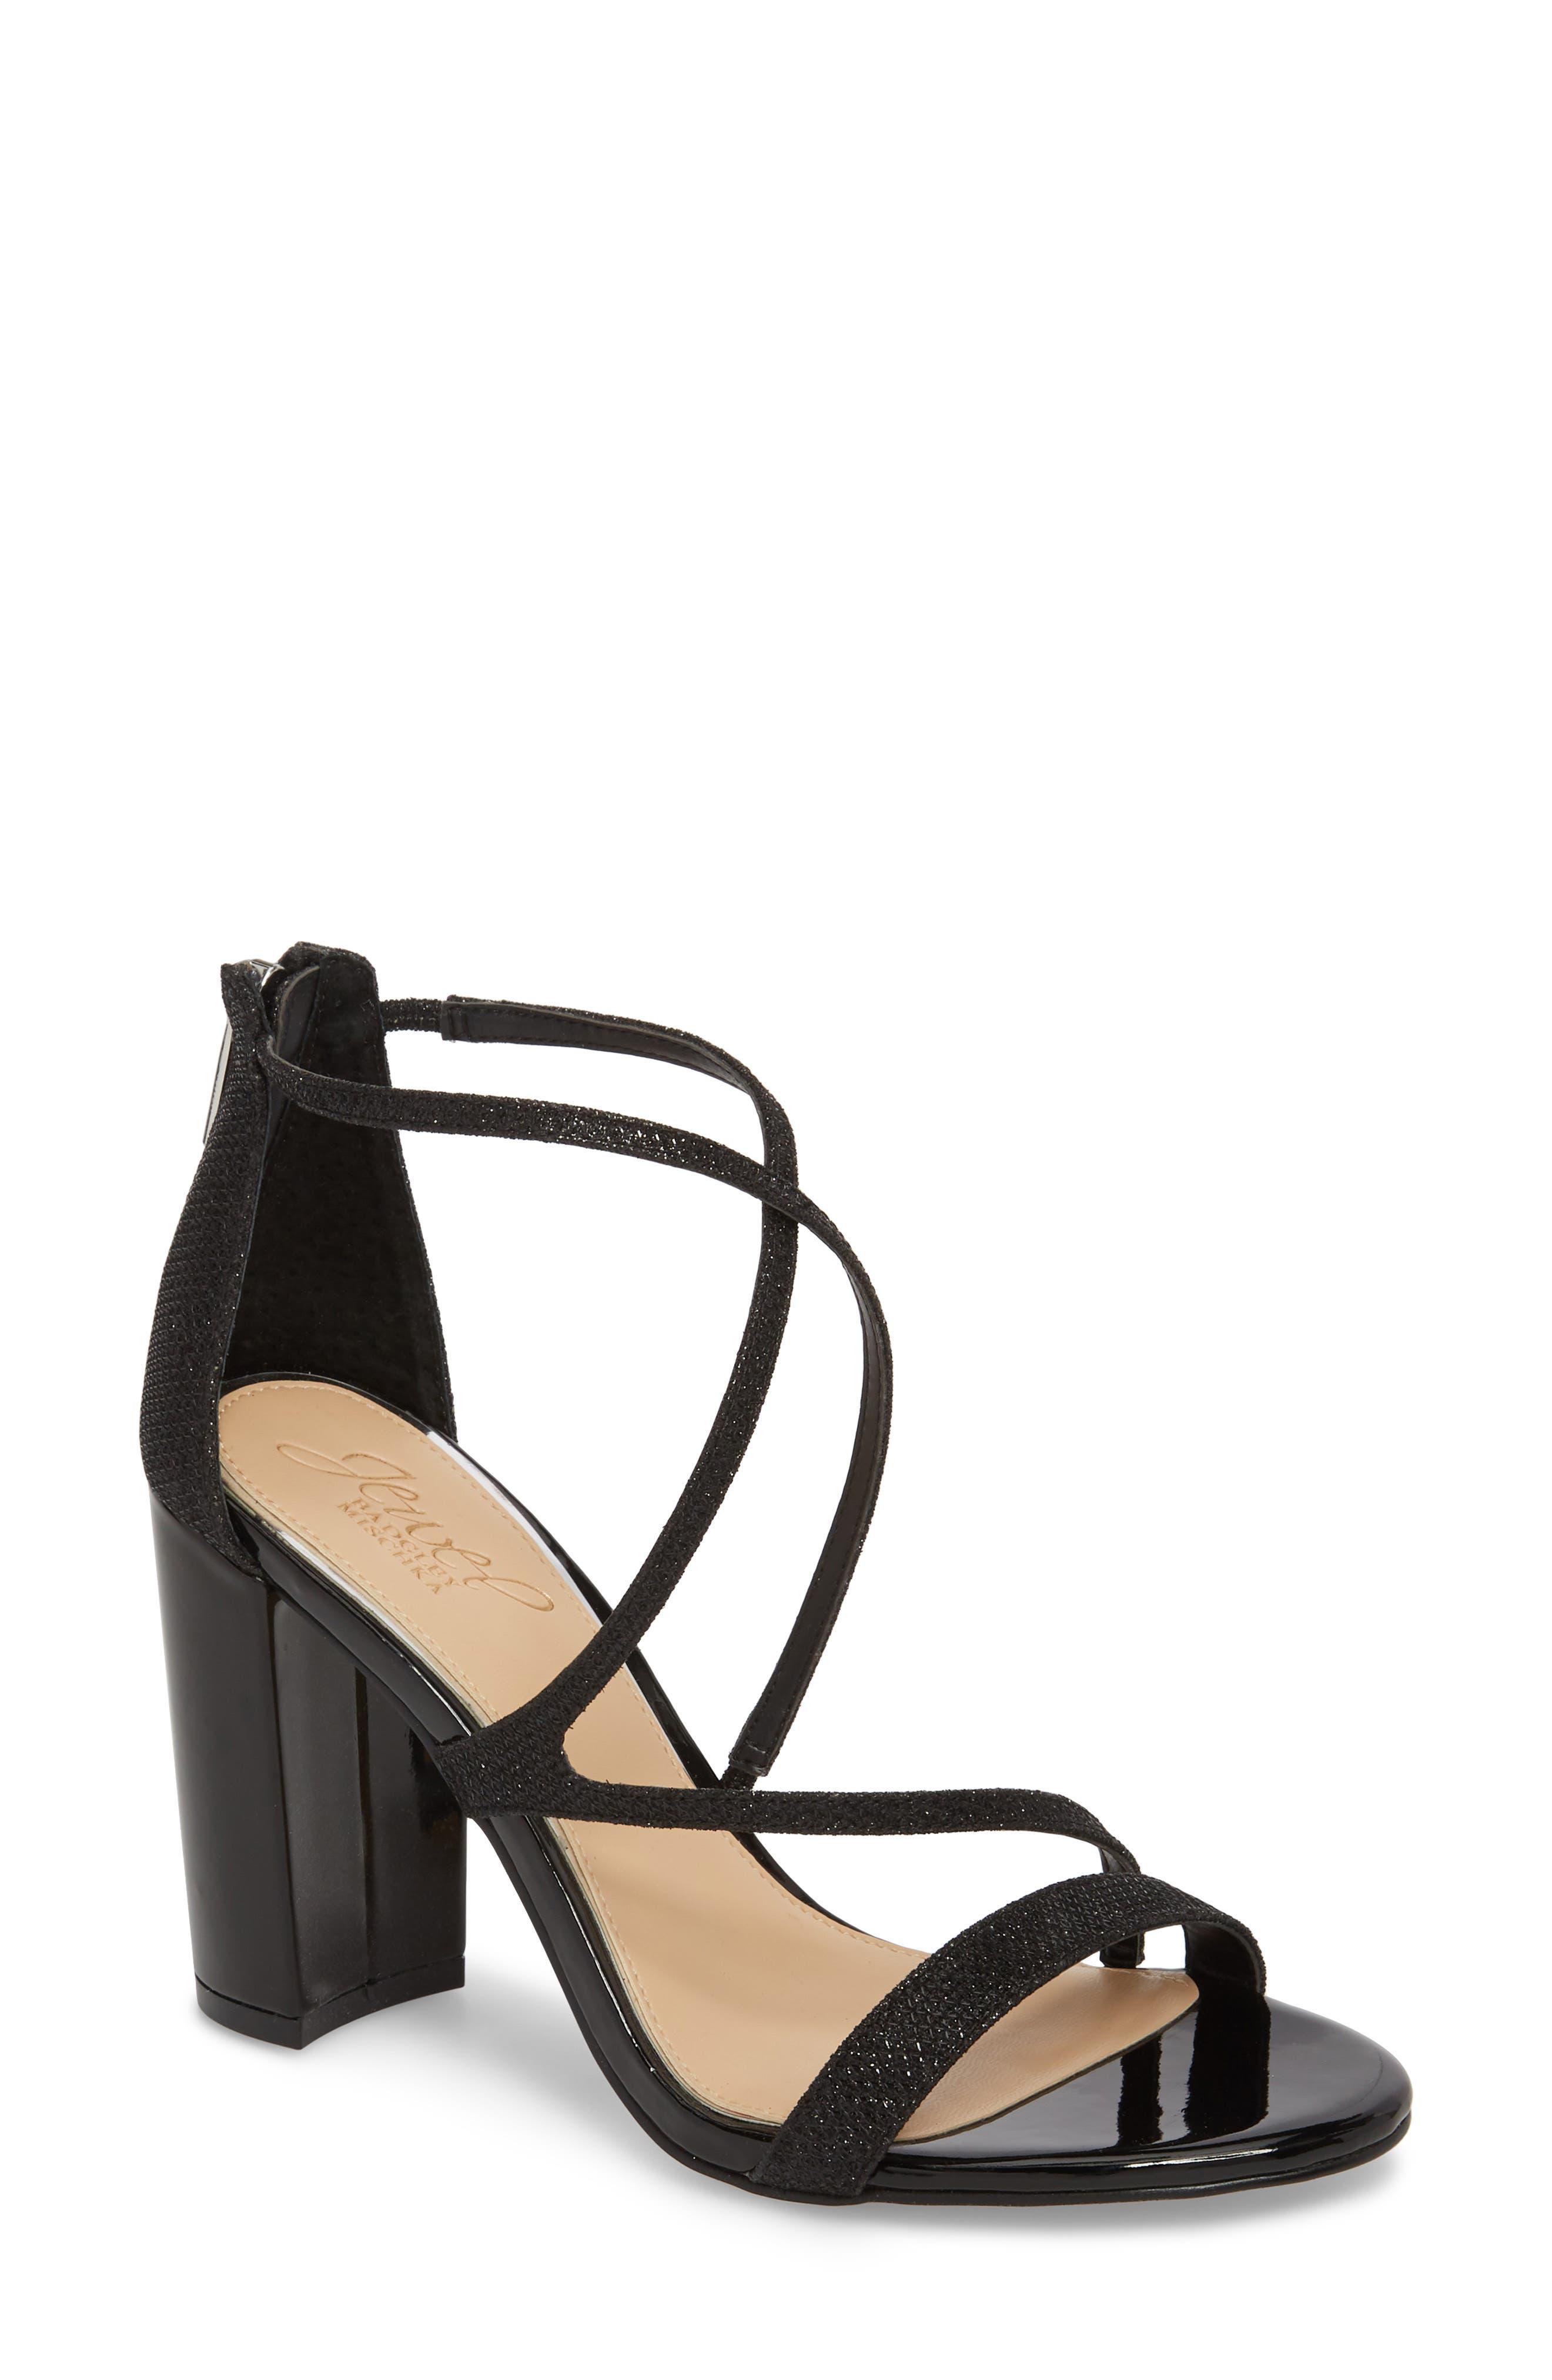 Badgley Mischka Gale Block Heel Sandal,                             Main thumbnail 1, color,                             BLACK GLITTER FABRIC